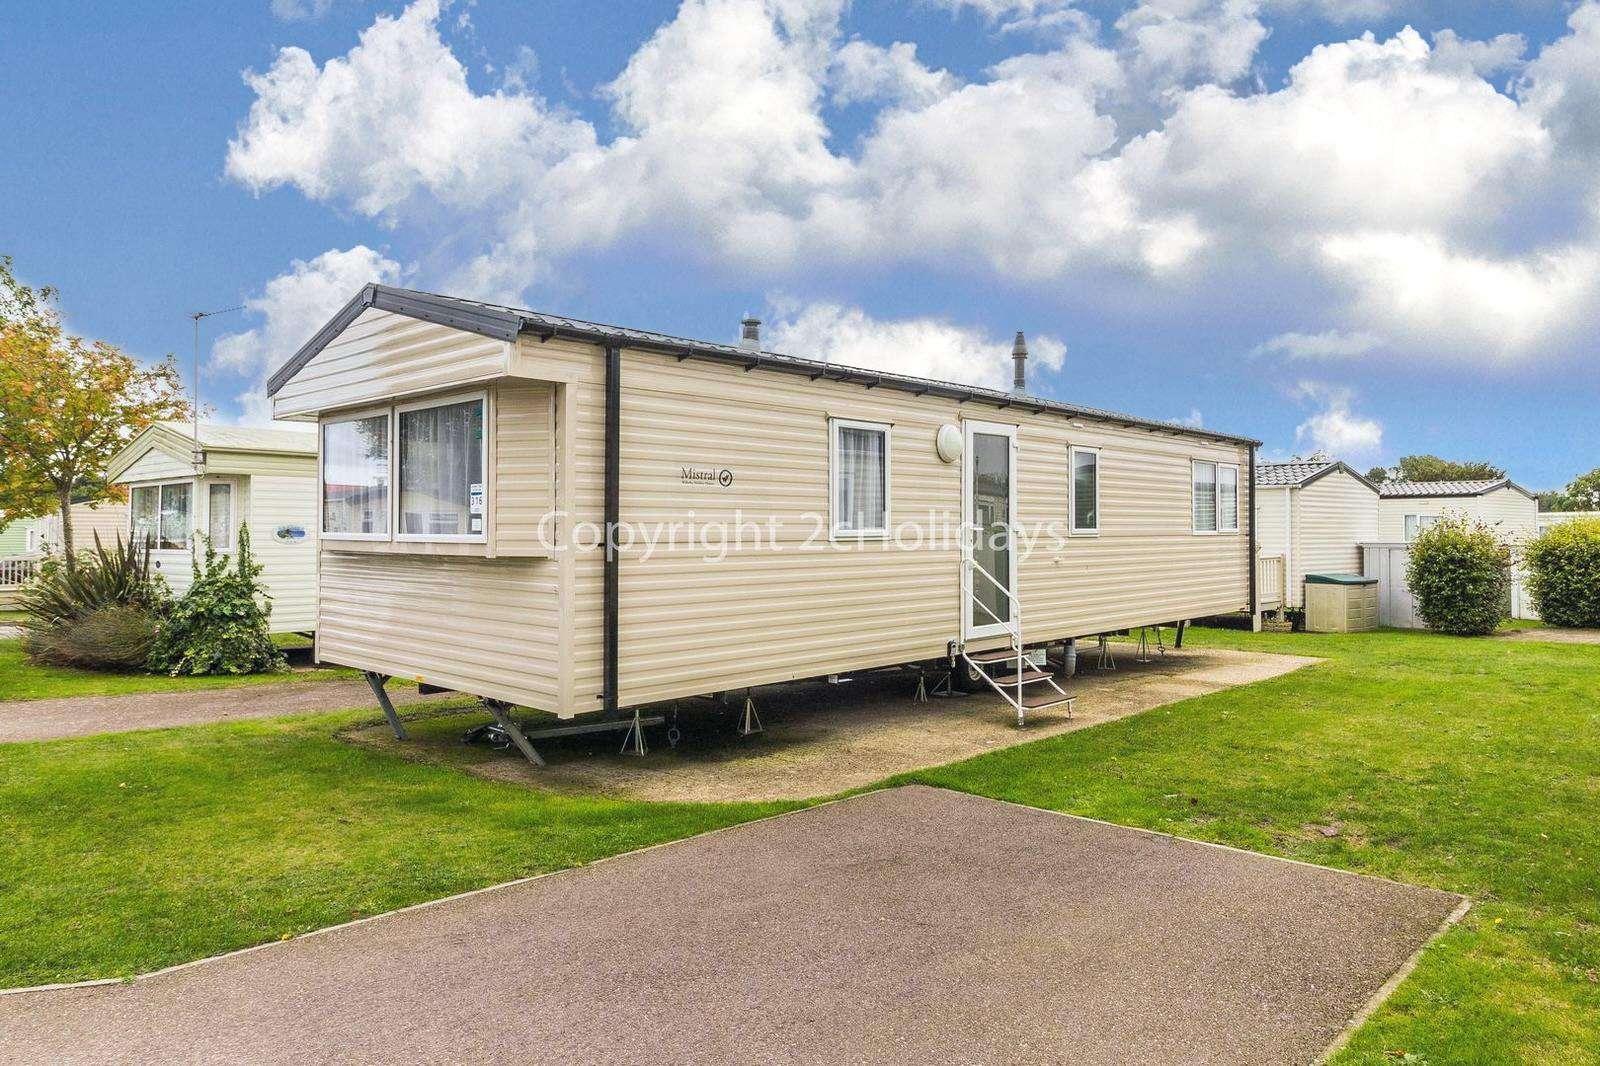 Superb caravan, only a short drive to beautiful Gorleston beach! - property